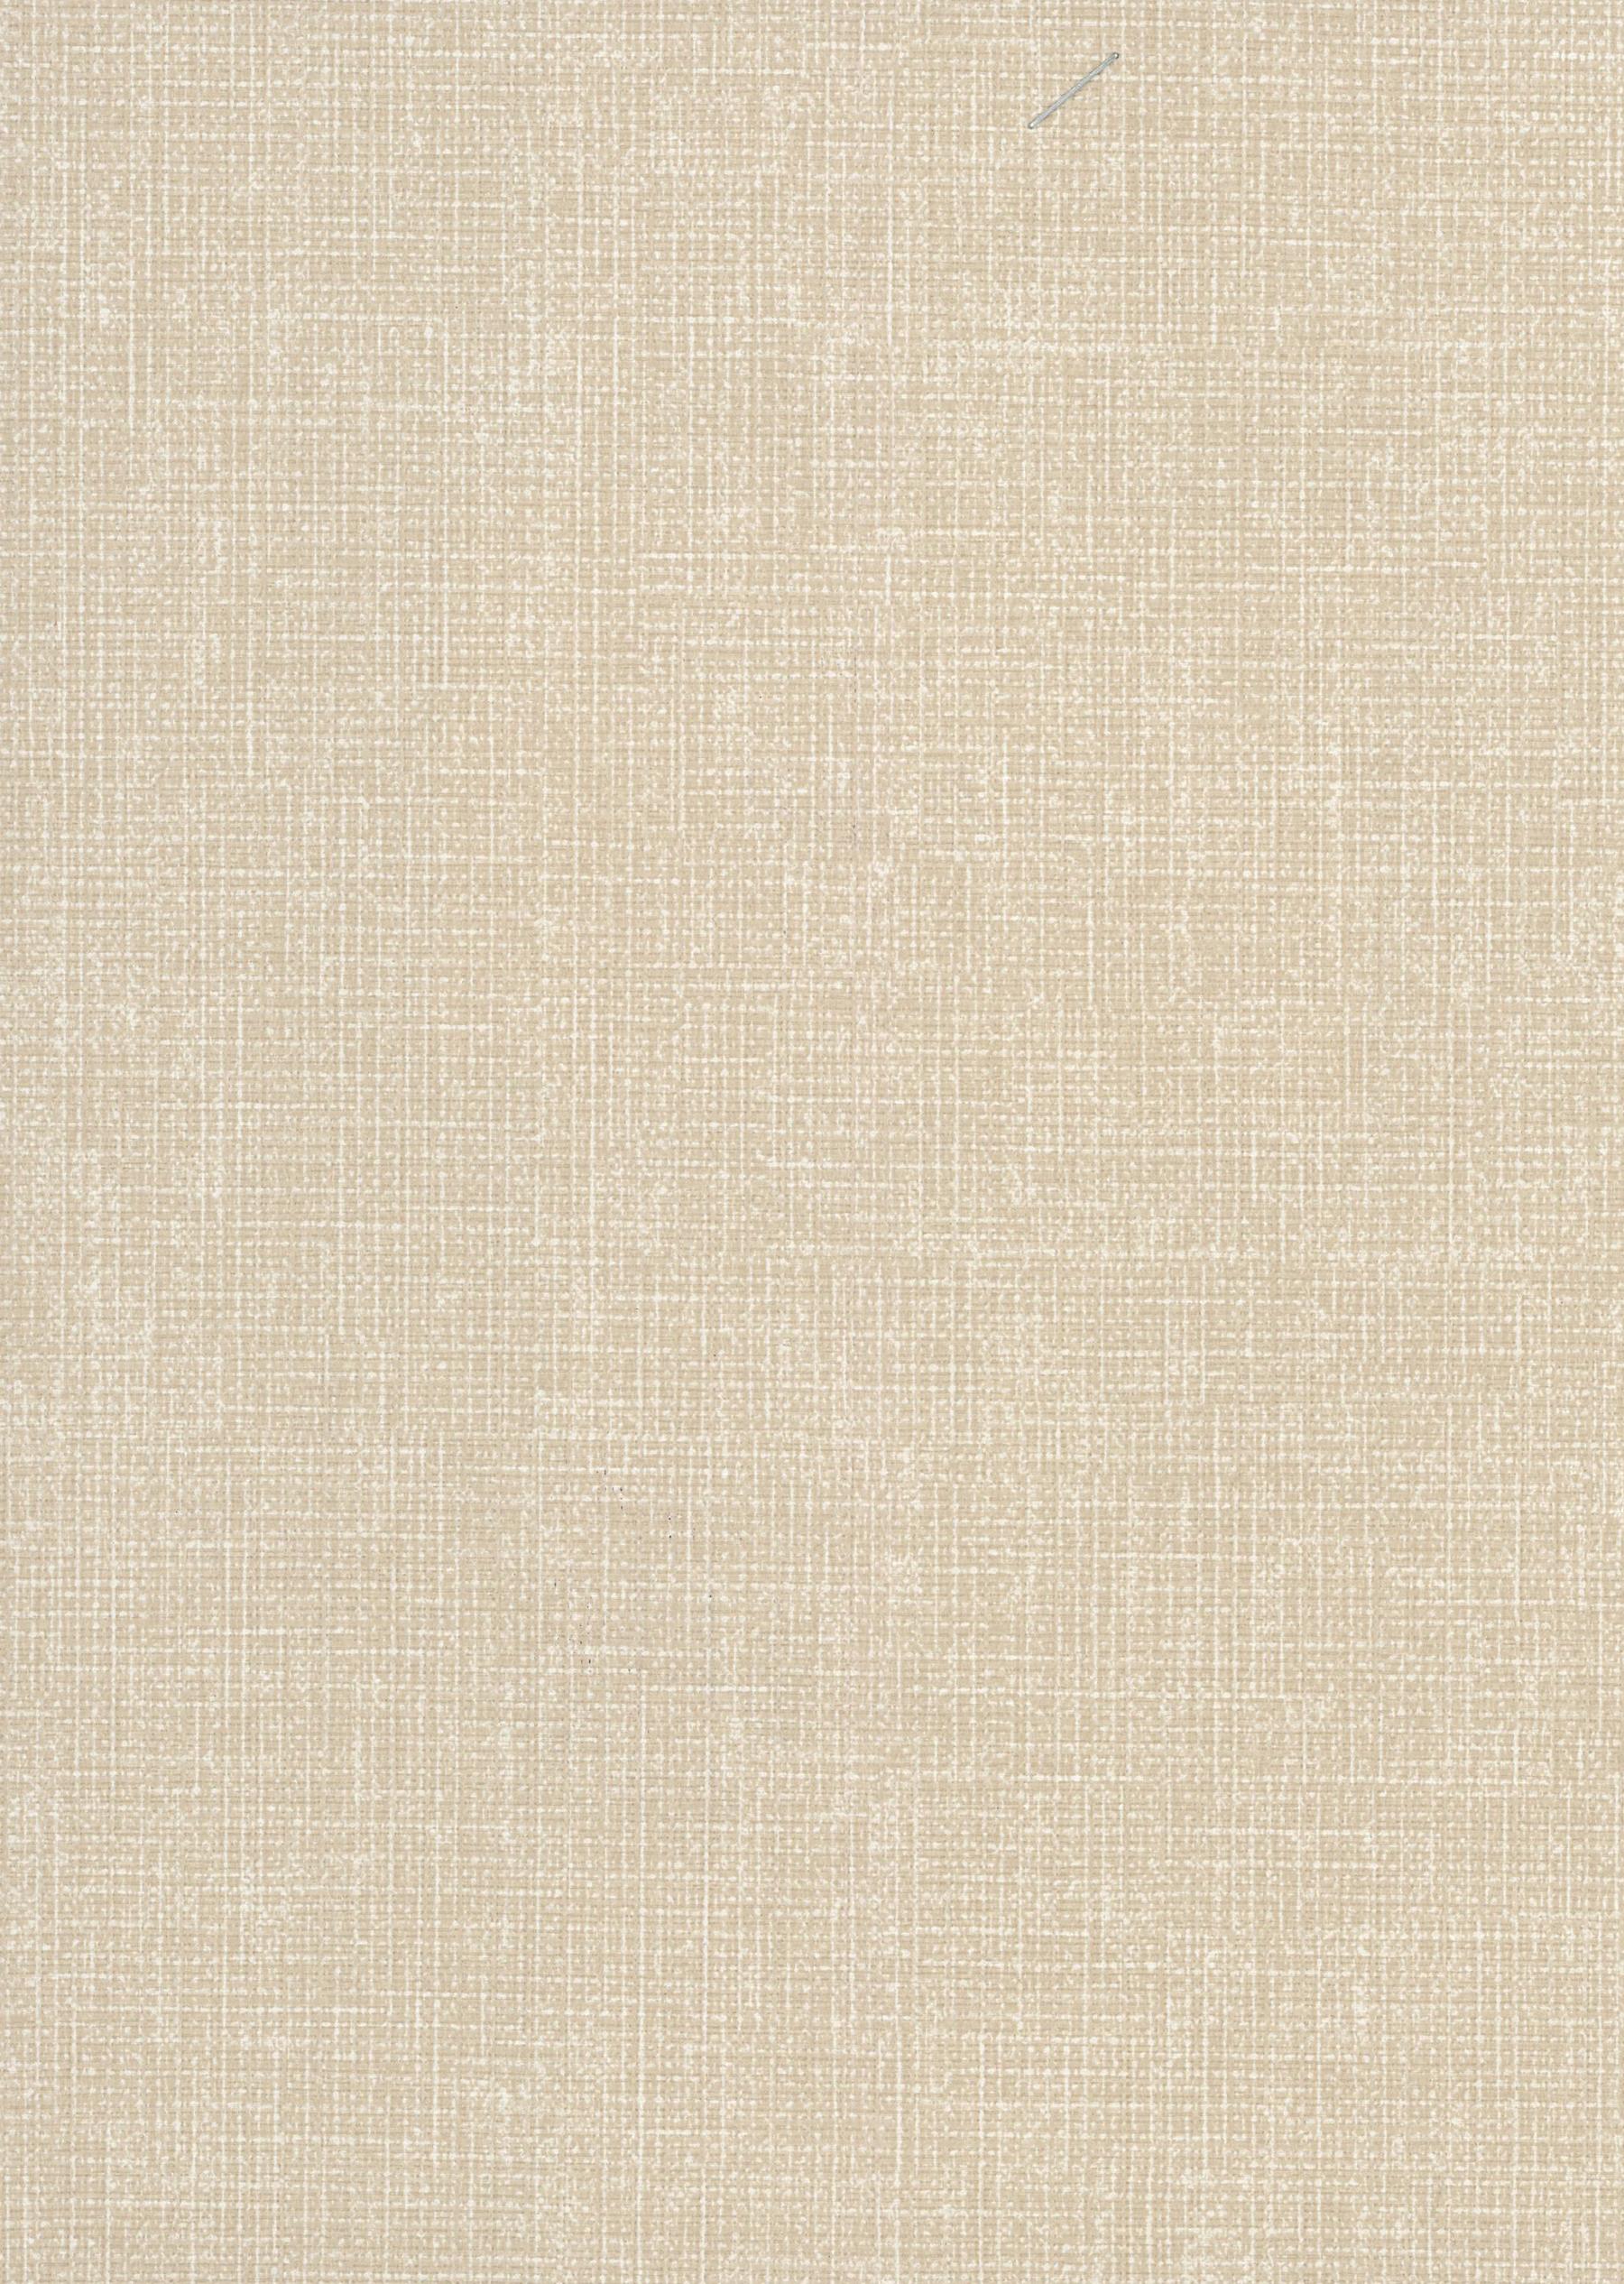 Picture of Arya Cream Fabric Texture Wallpaper